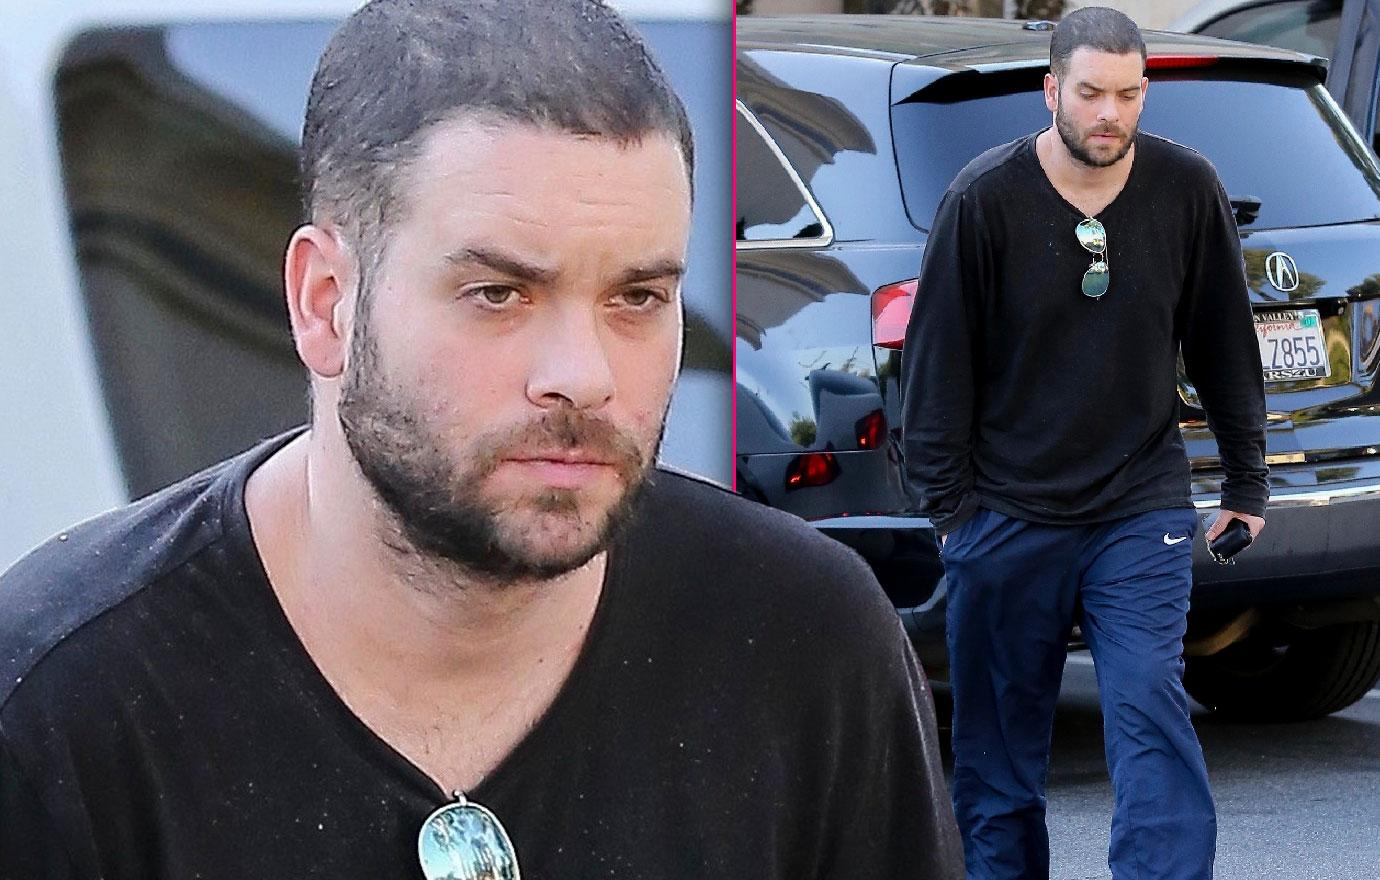 //shamed former glee star mark salling gets ready for jail wyrtaefsdz